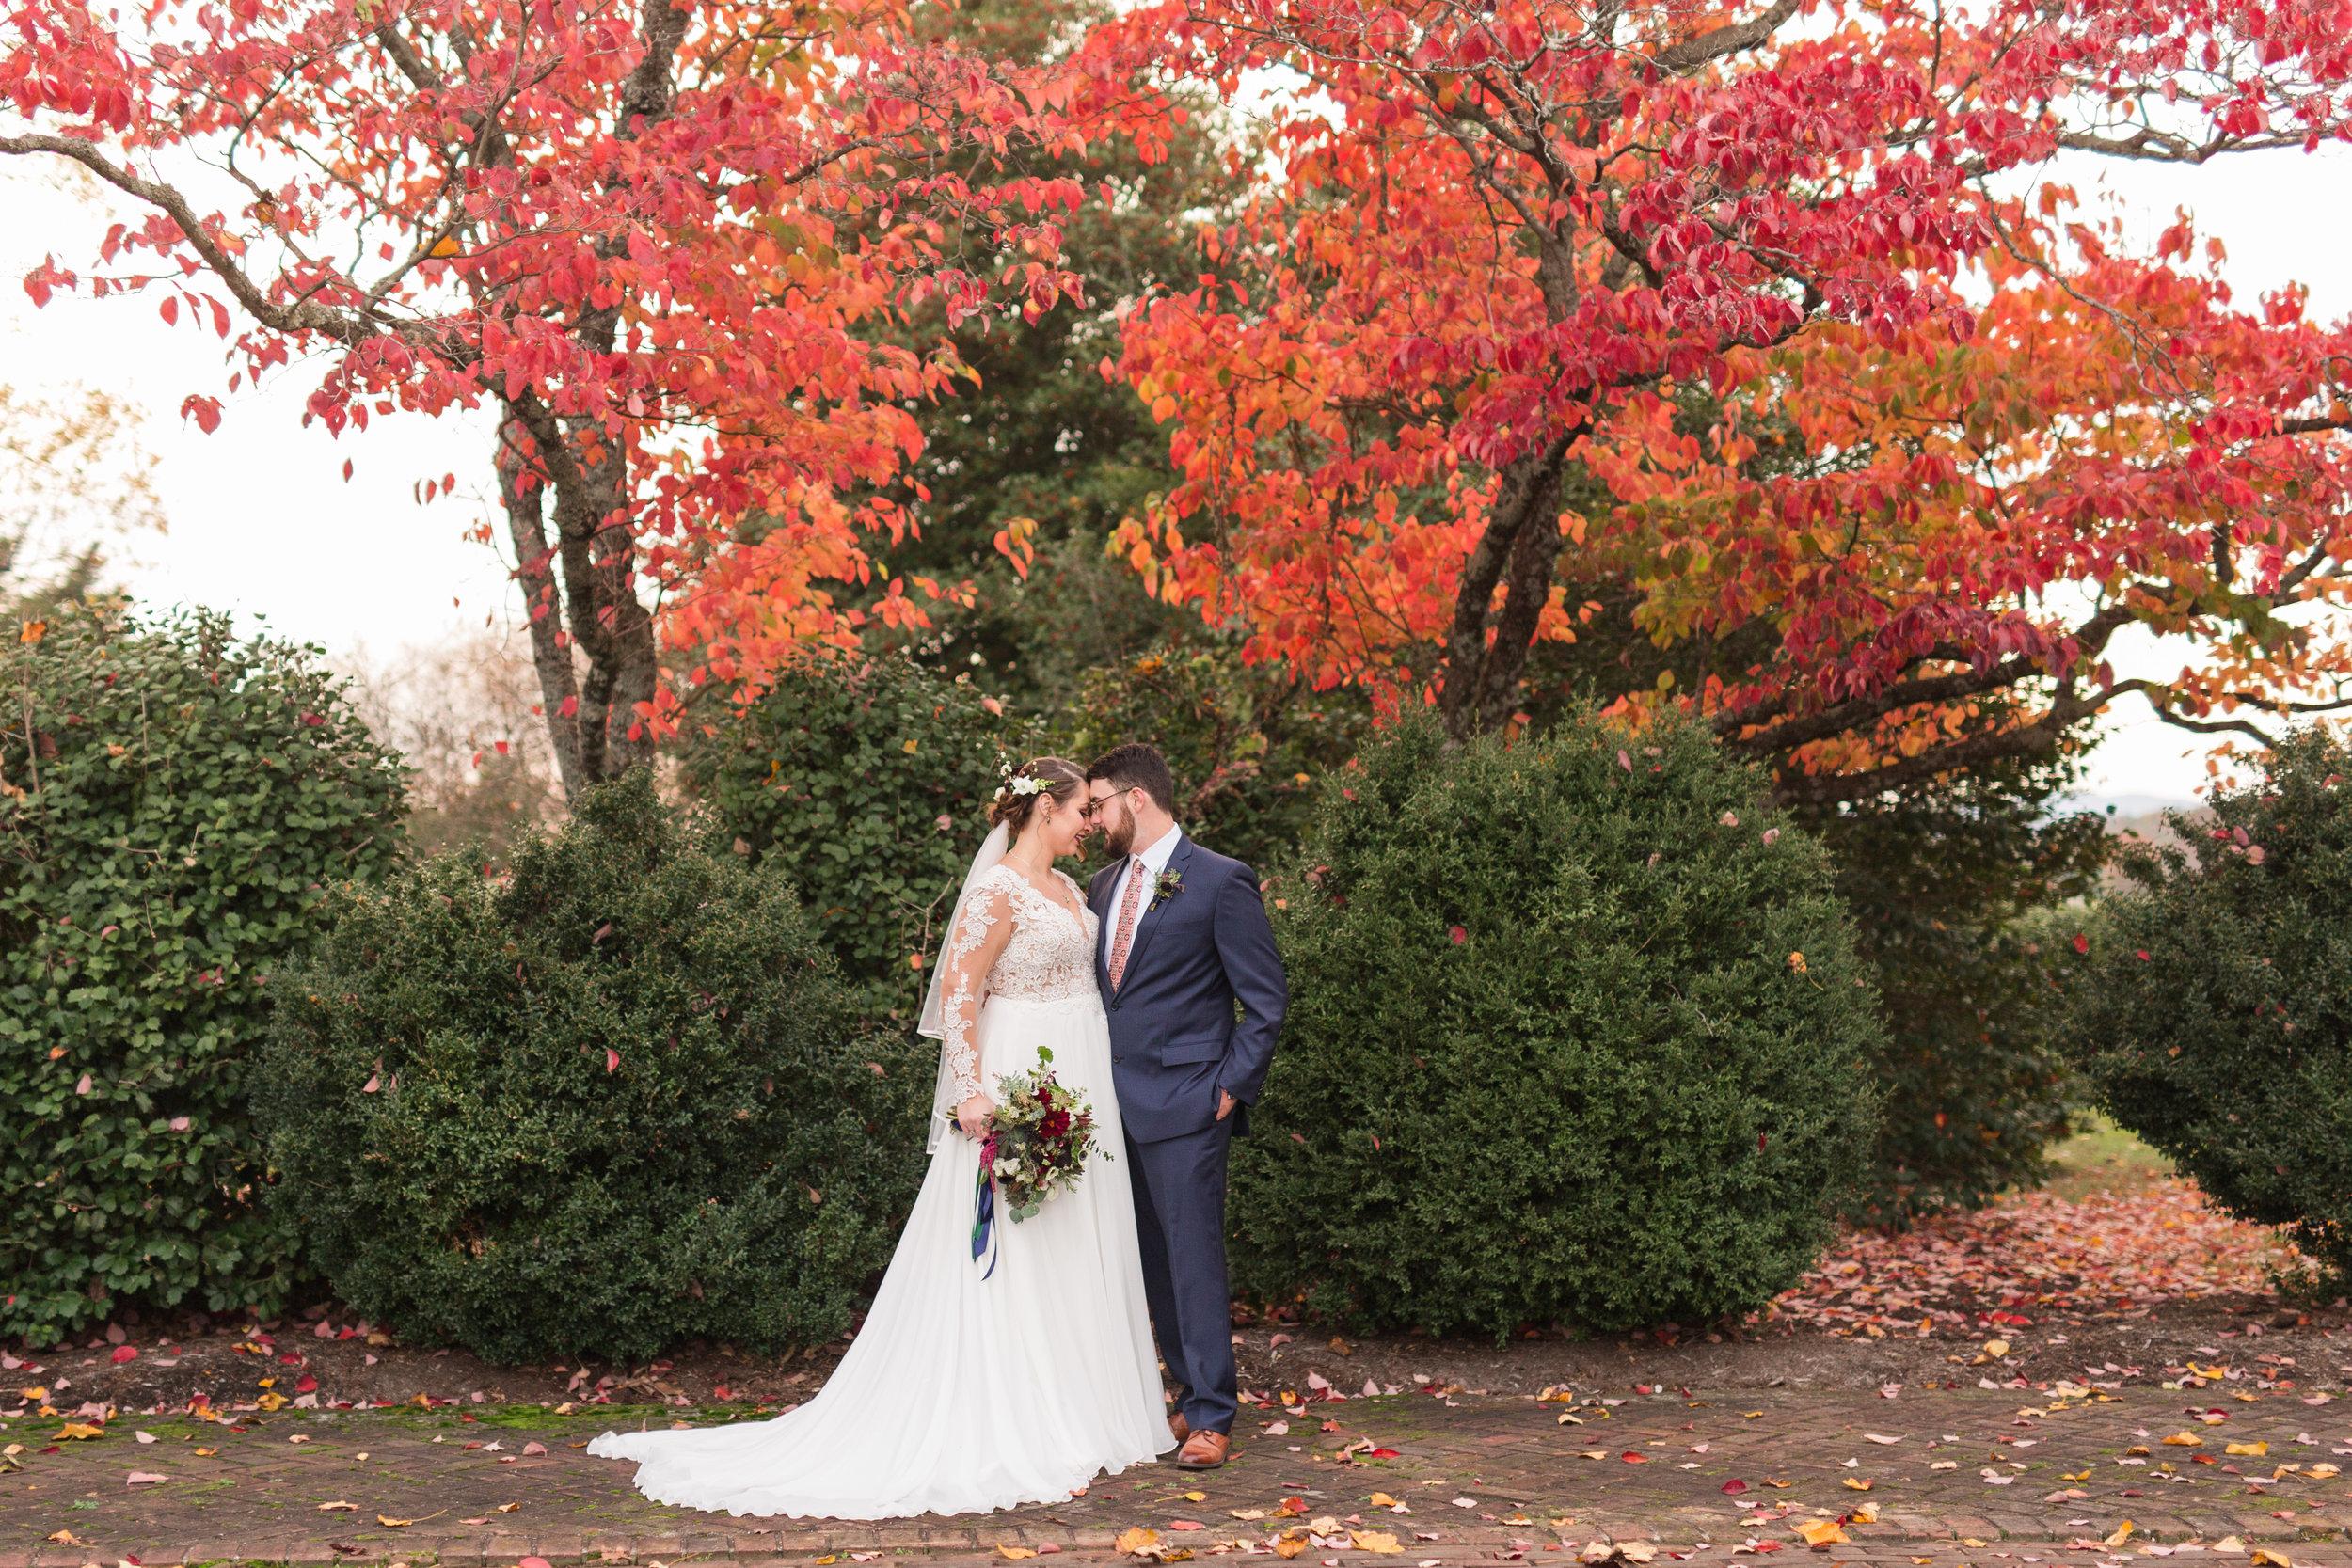 Lynchburg and Charlottesville Wedding and Portrait Photographer || The Trivium Estate Wedding || www.ashleyeiban.com